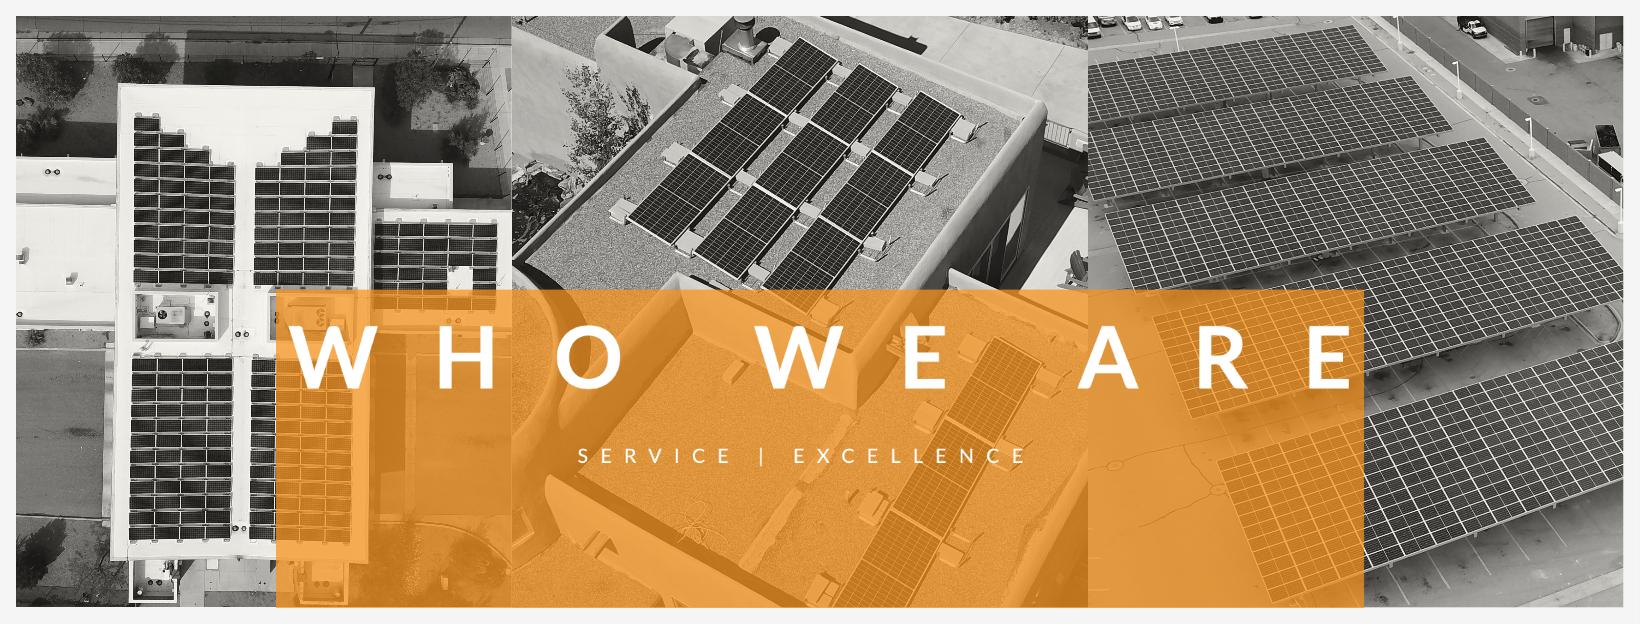 About Sol Luna Solar, New Mexico Solar Installer